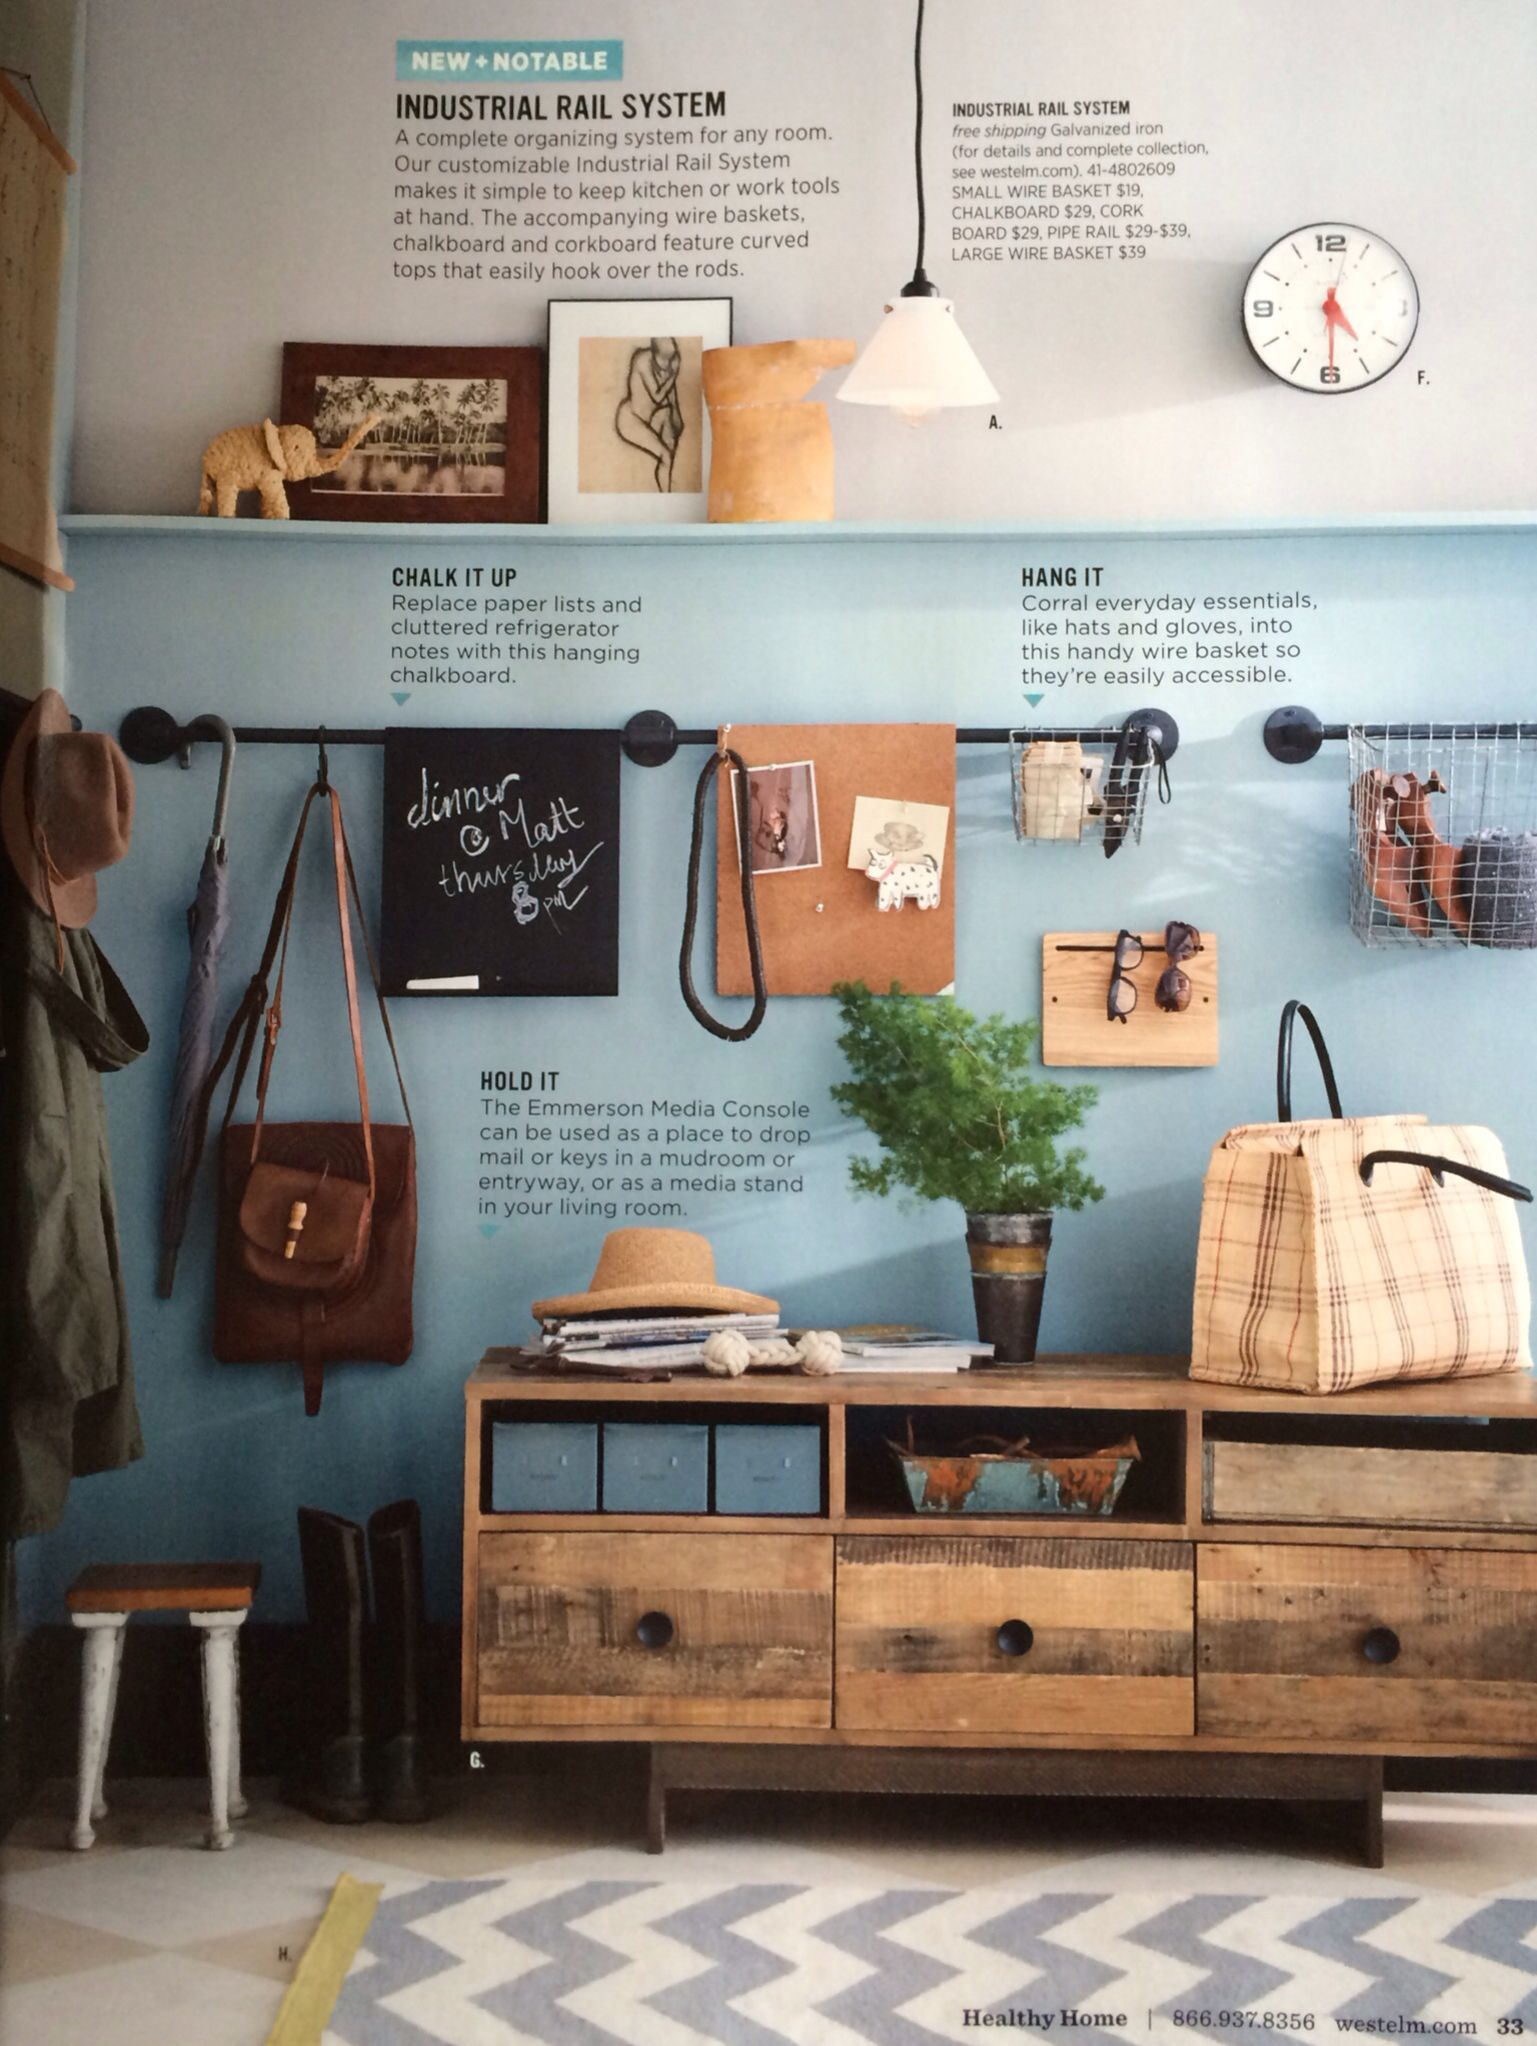 Hooks and seating by garage door. | Kitchen Design | Pinterest ...